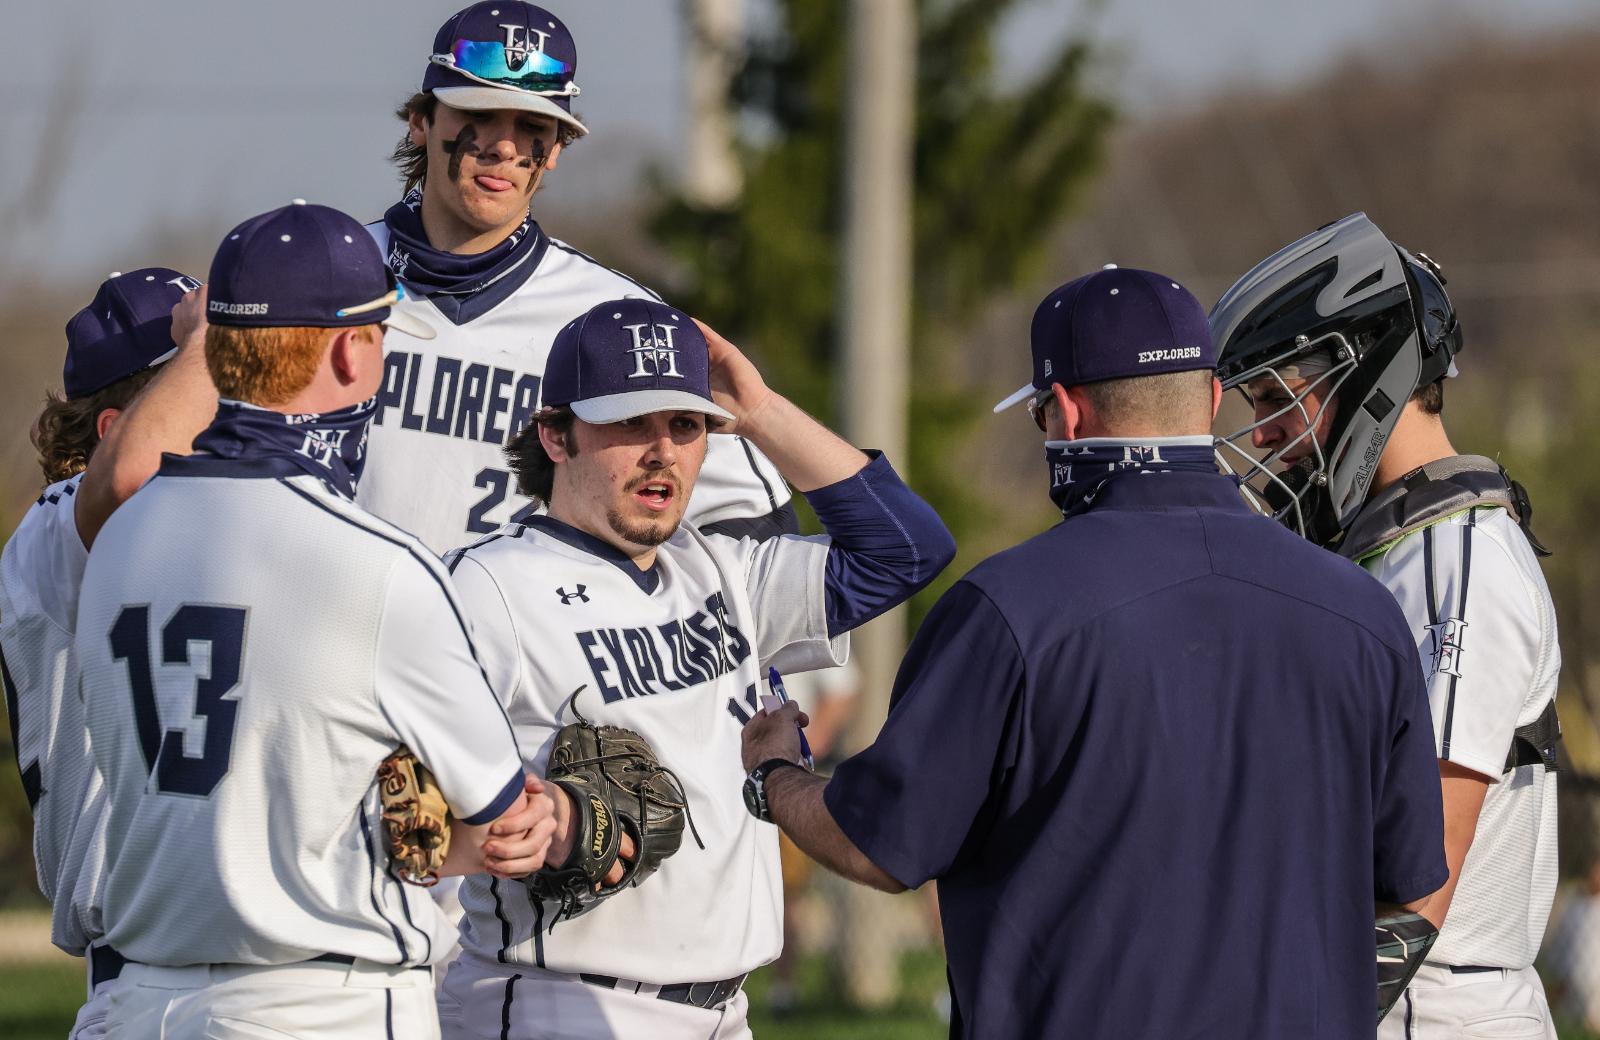 Images From Hudson Baseball vs Wadsworth